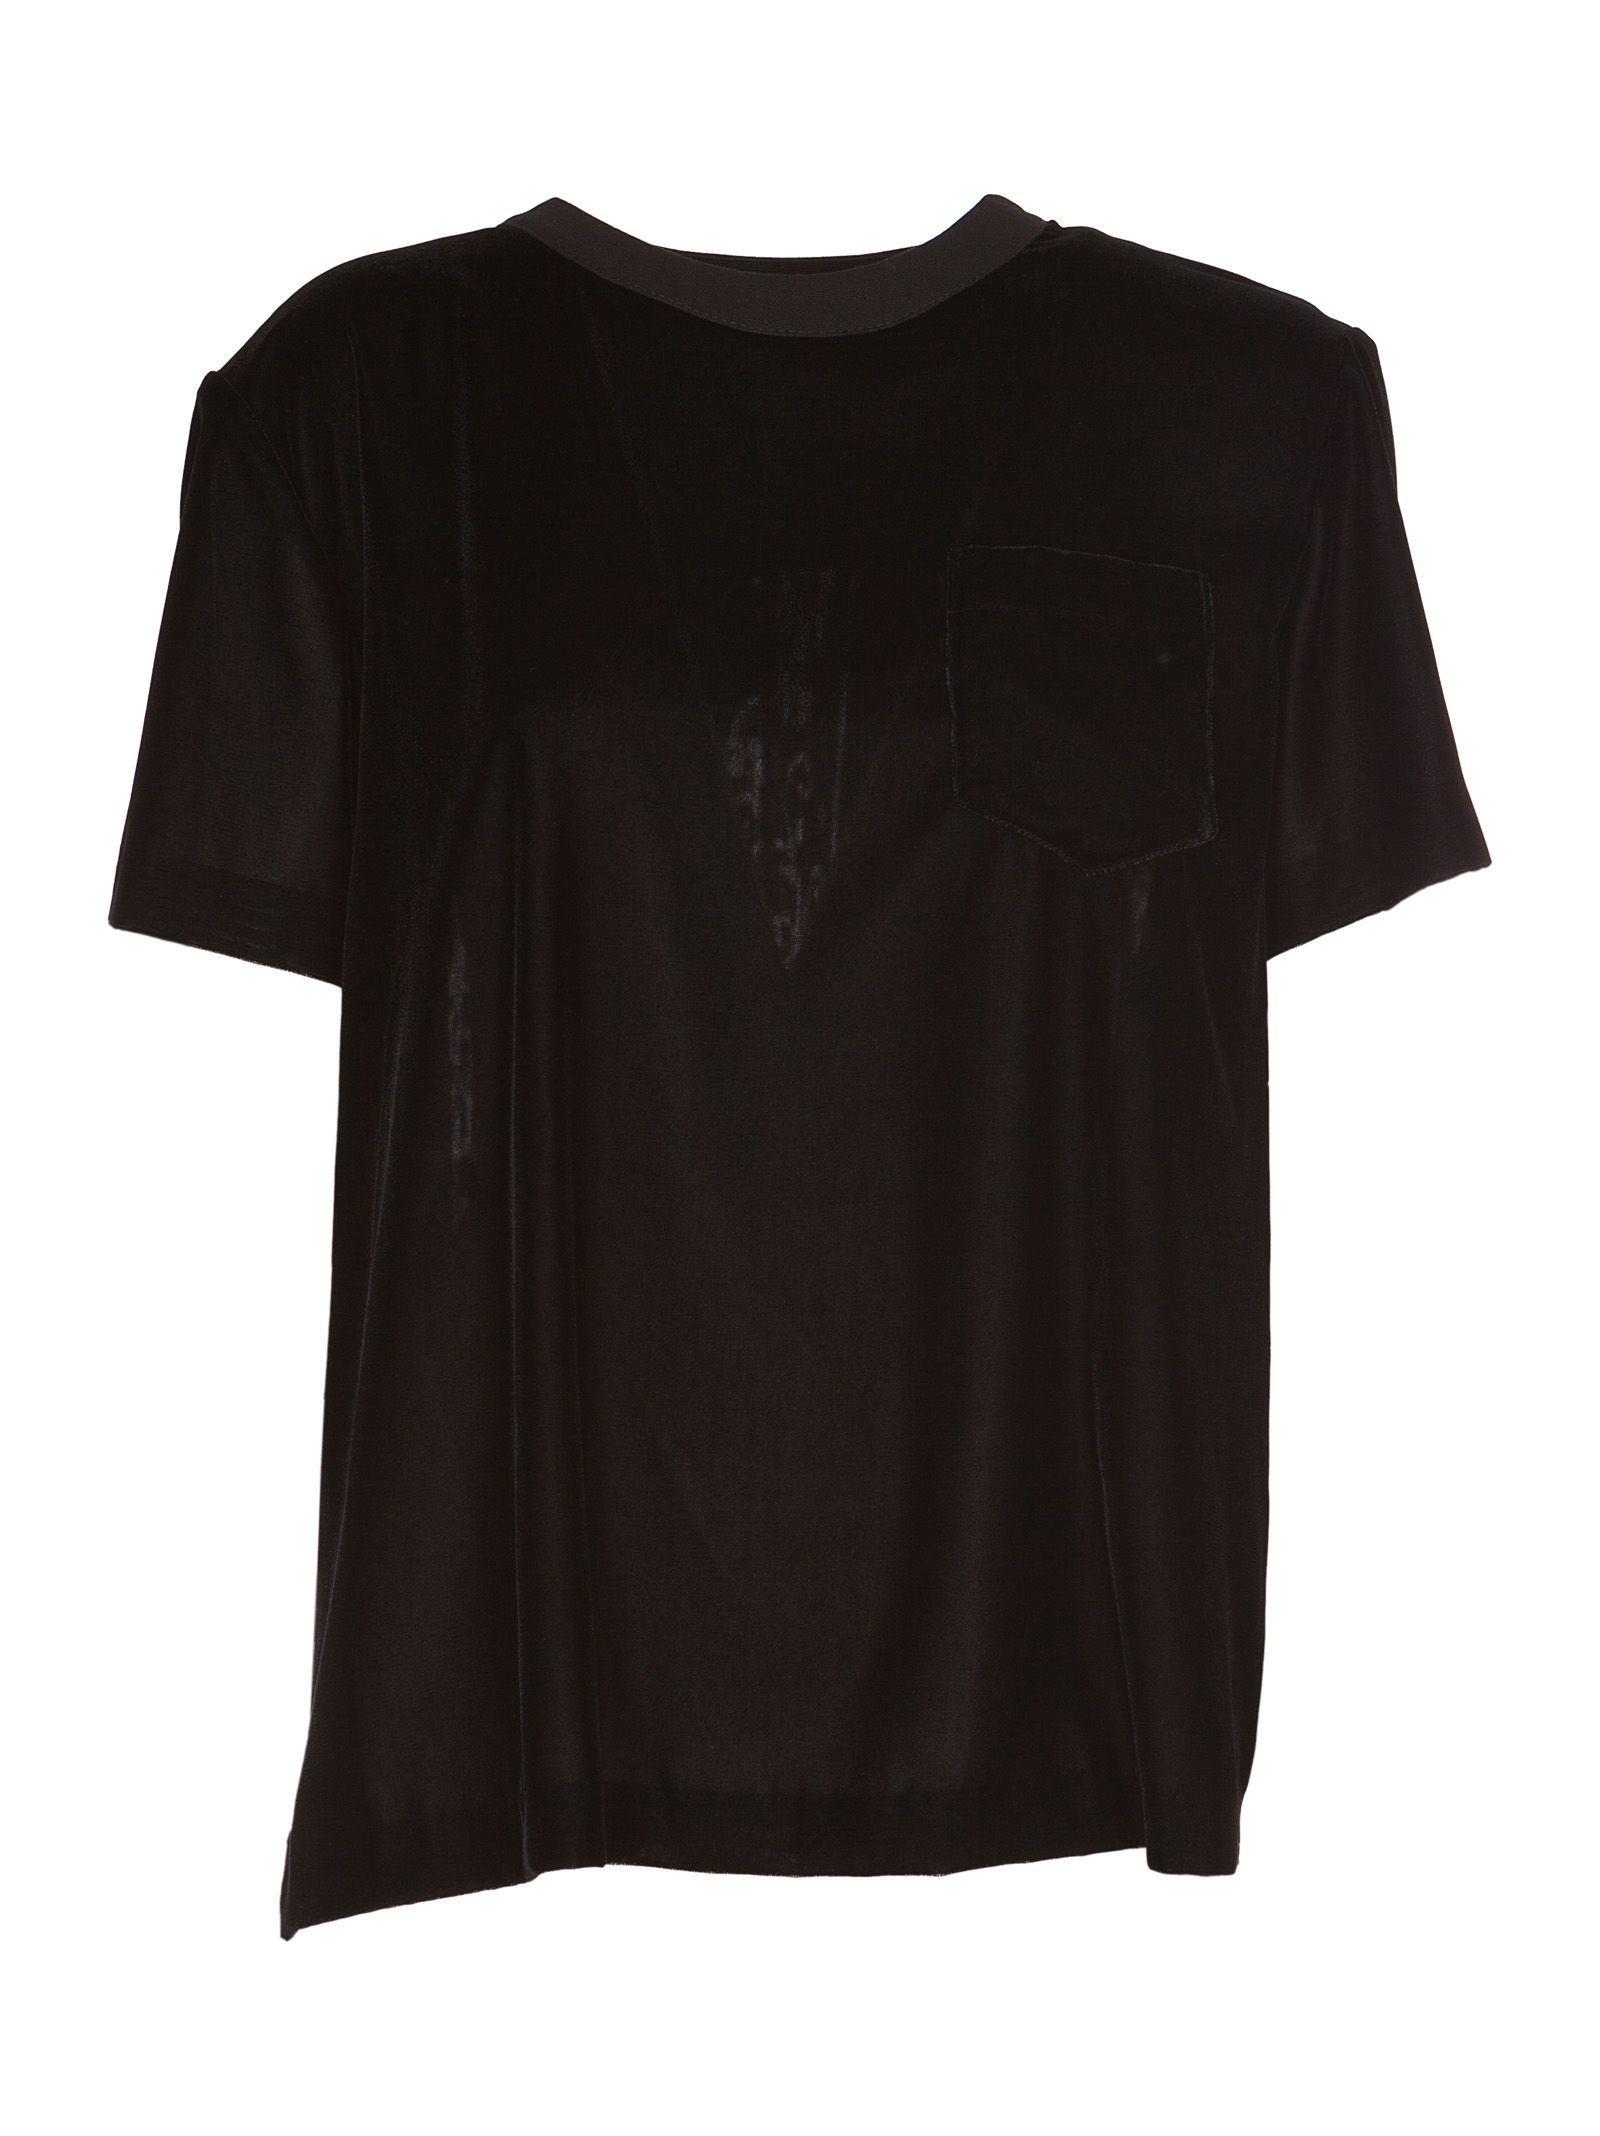 Sacai Iridescent Chiffon Panel T-shirt